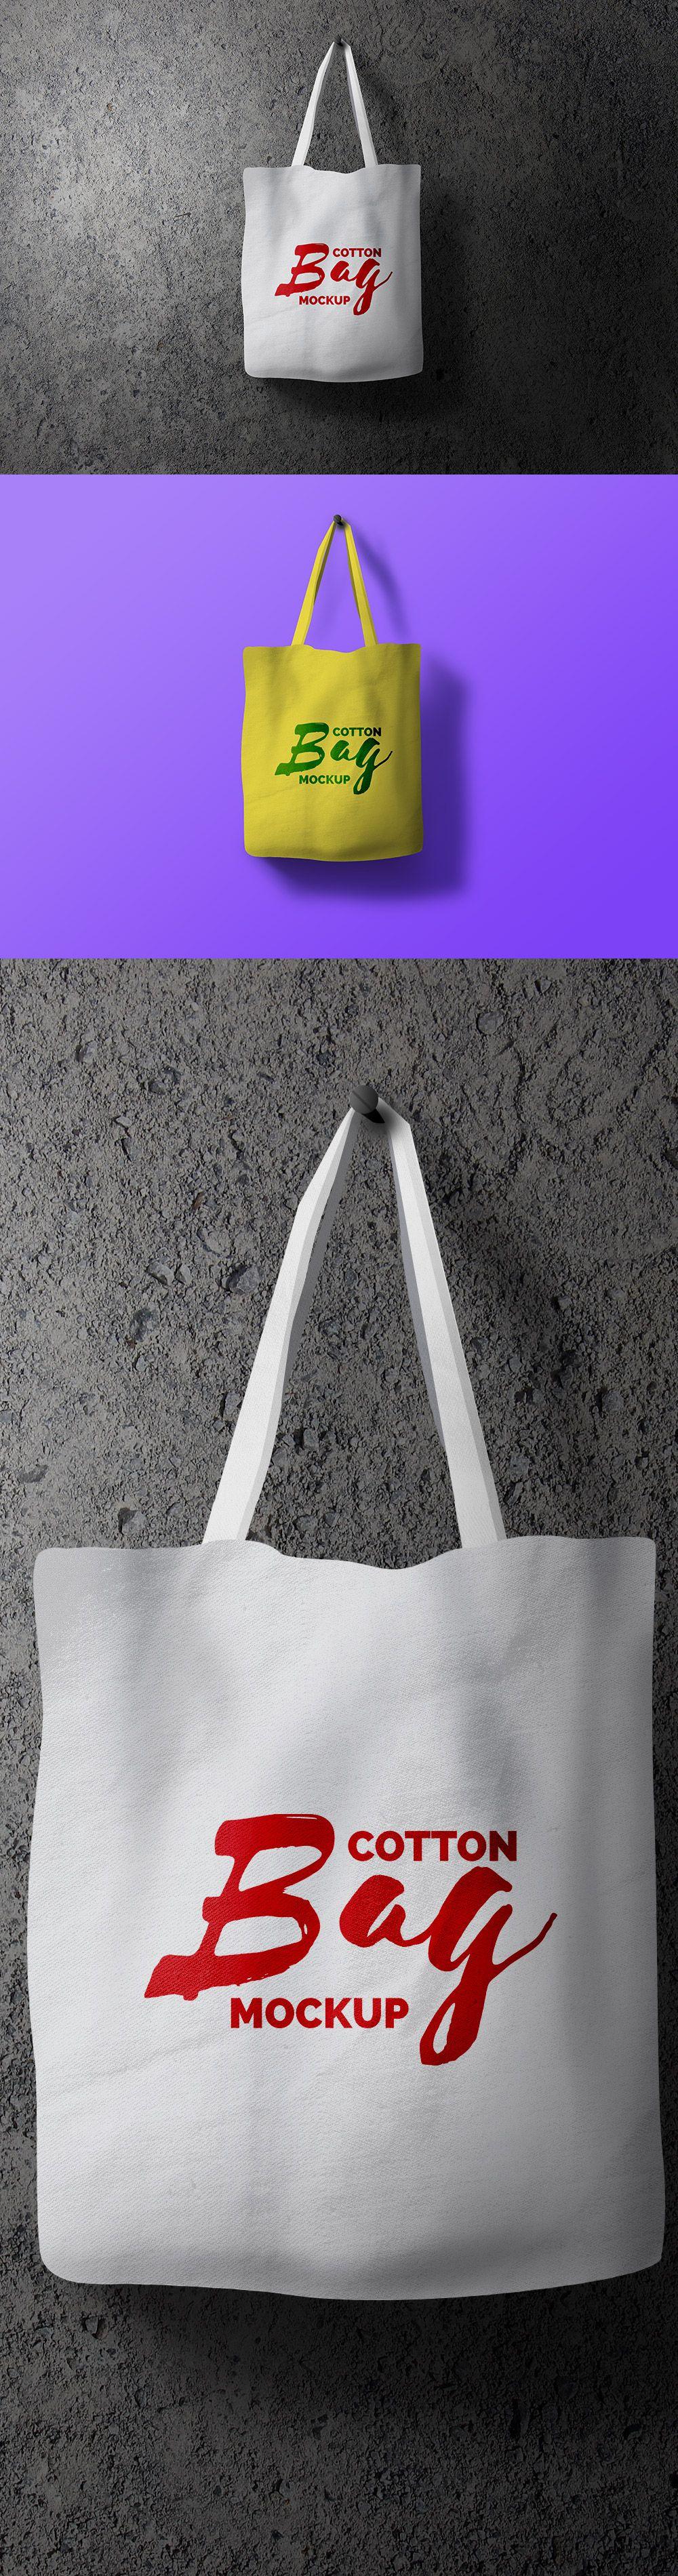 Download Cotton Bag Mockup Psd Graphicsfuel Bag Mockup Mockup Free Psd Download Mockup Free Psd